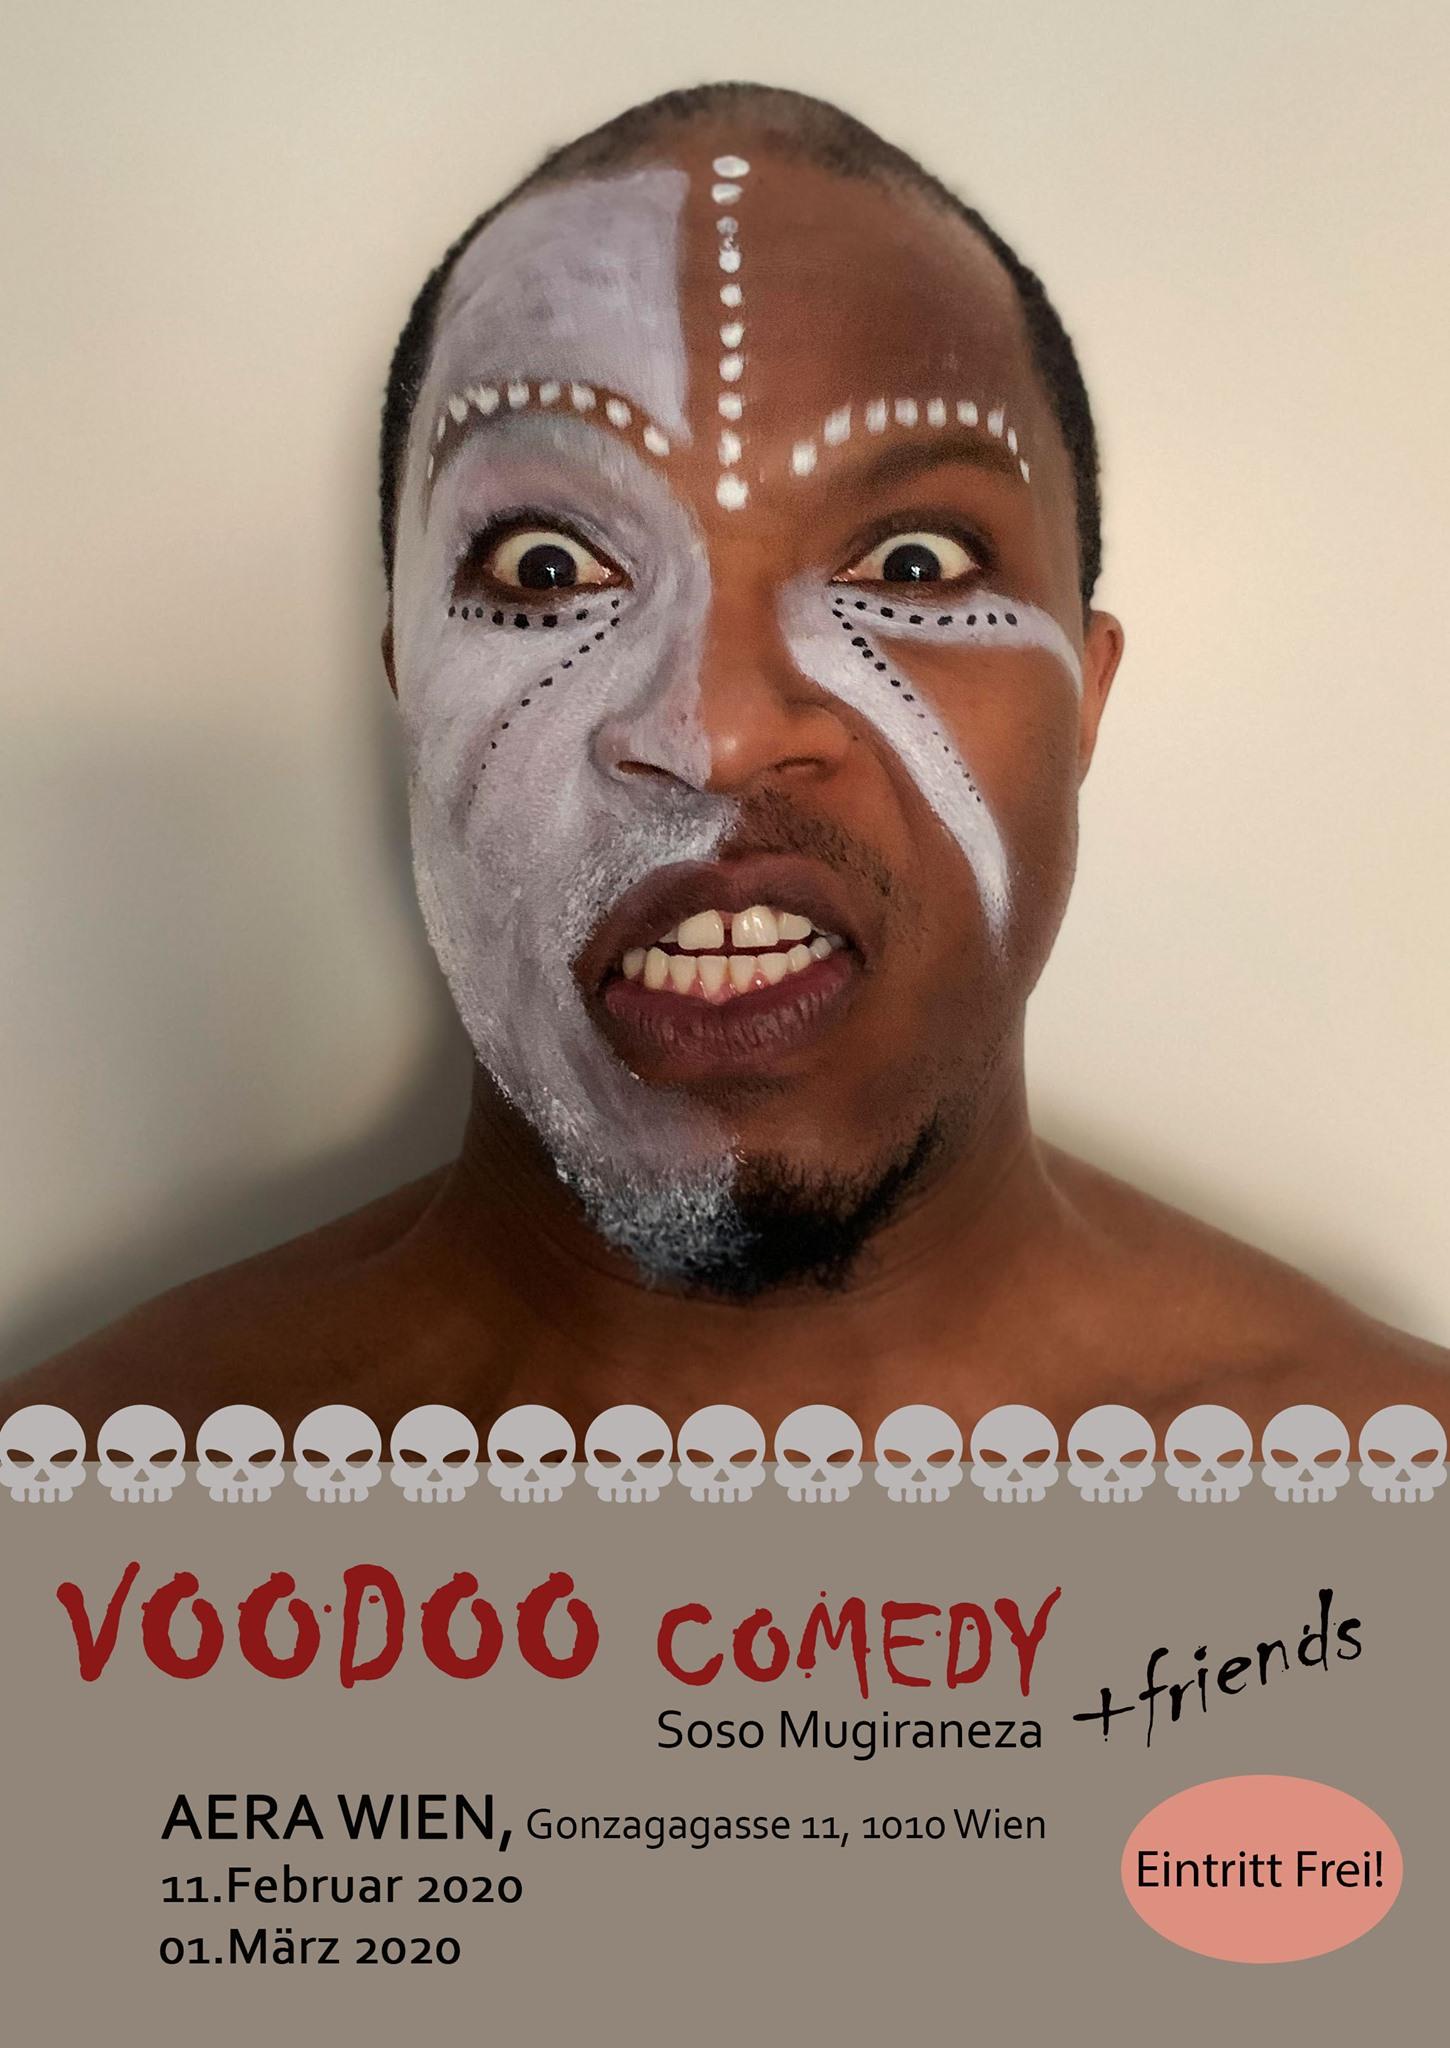 Voodoo Comedy am 11. February 2020 @ Aera.